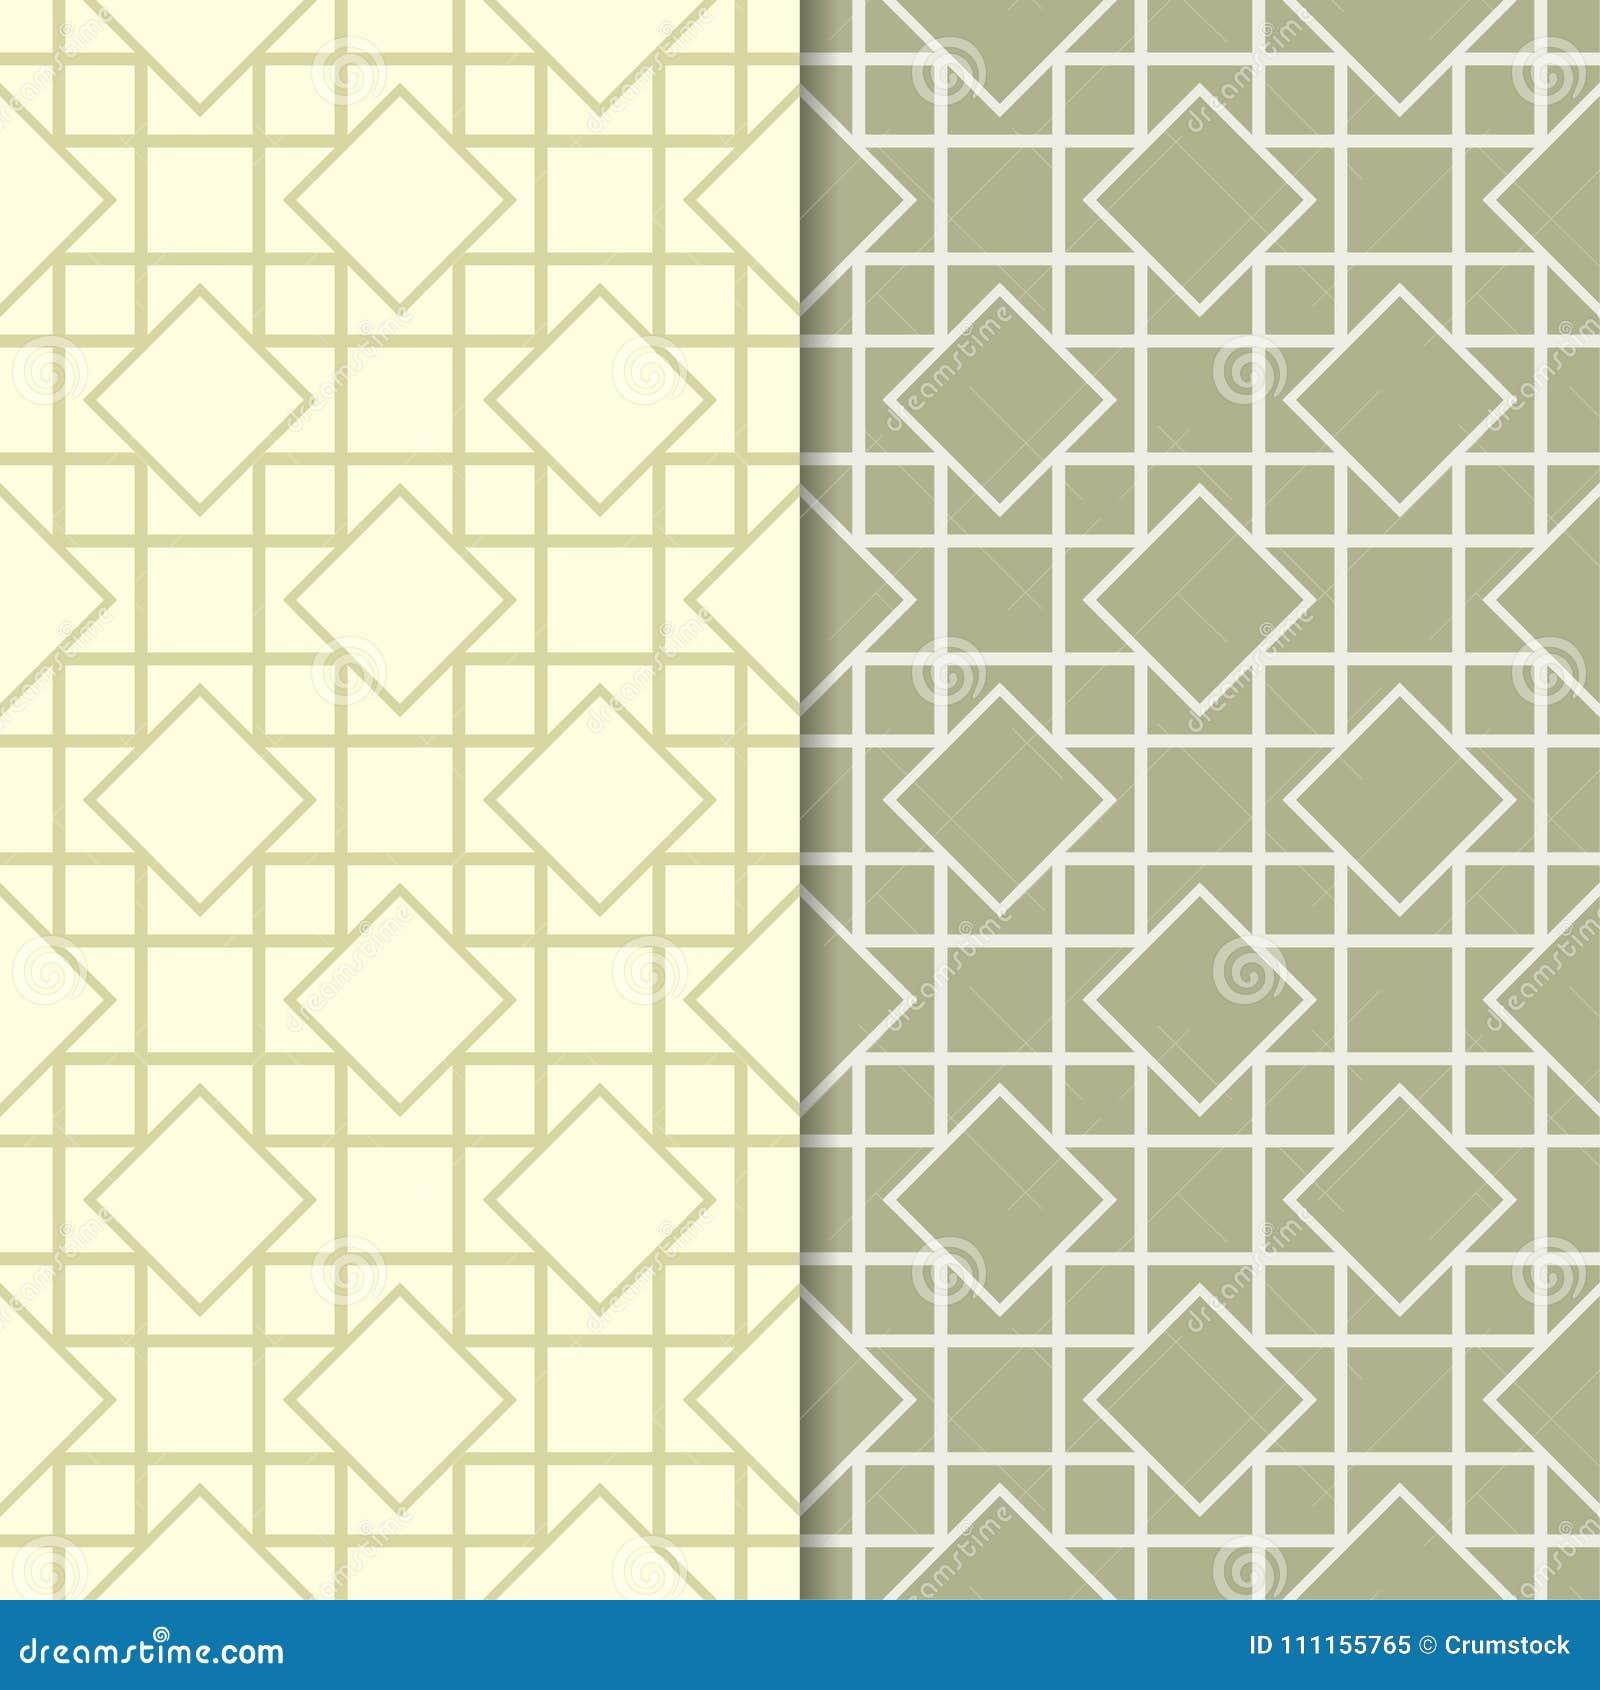 Olive green set of seamless geometric patterns